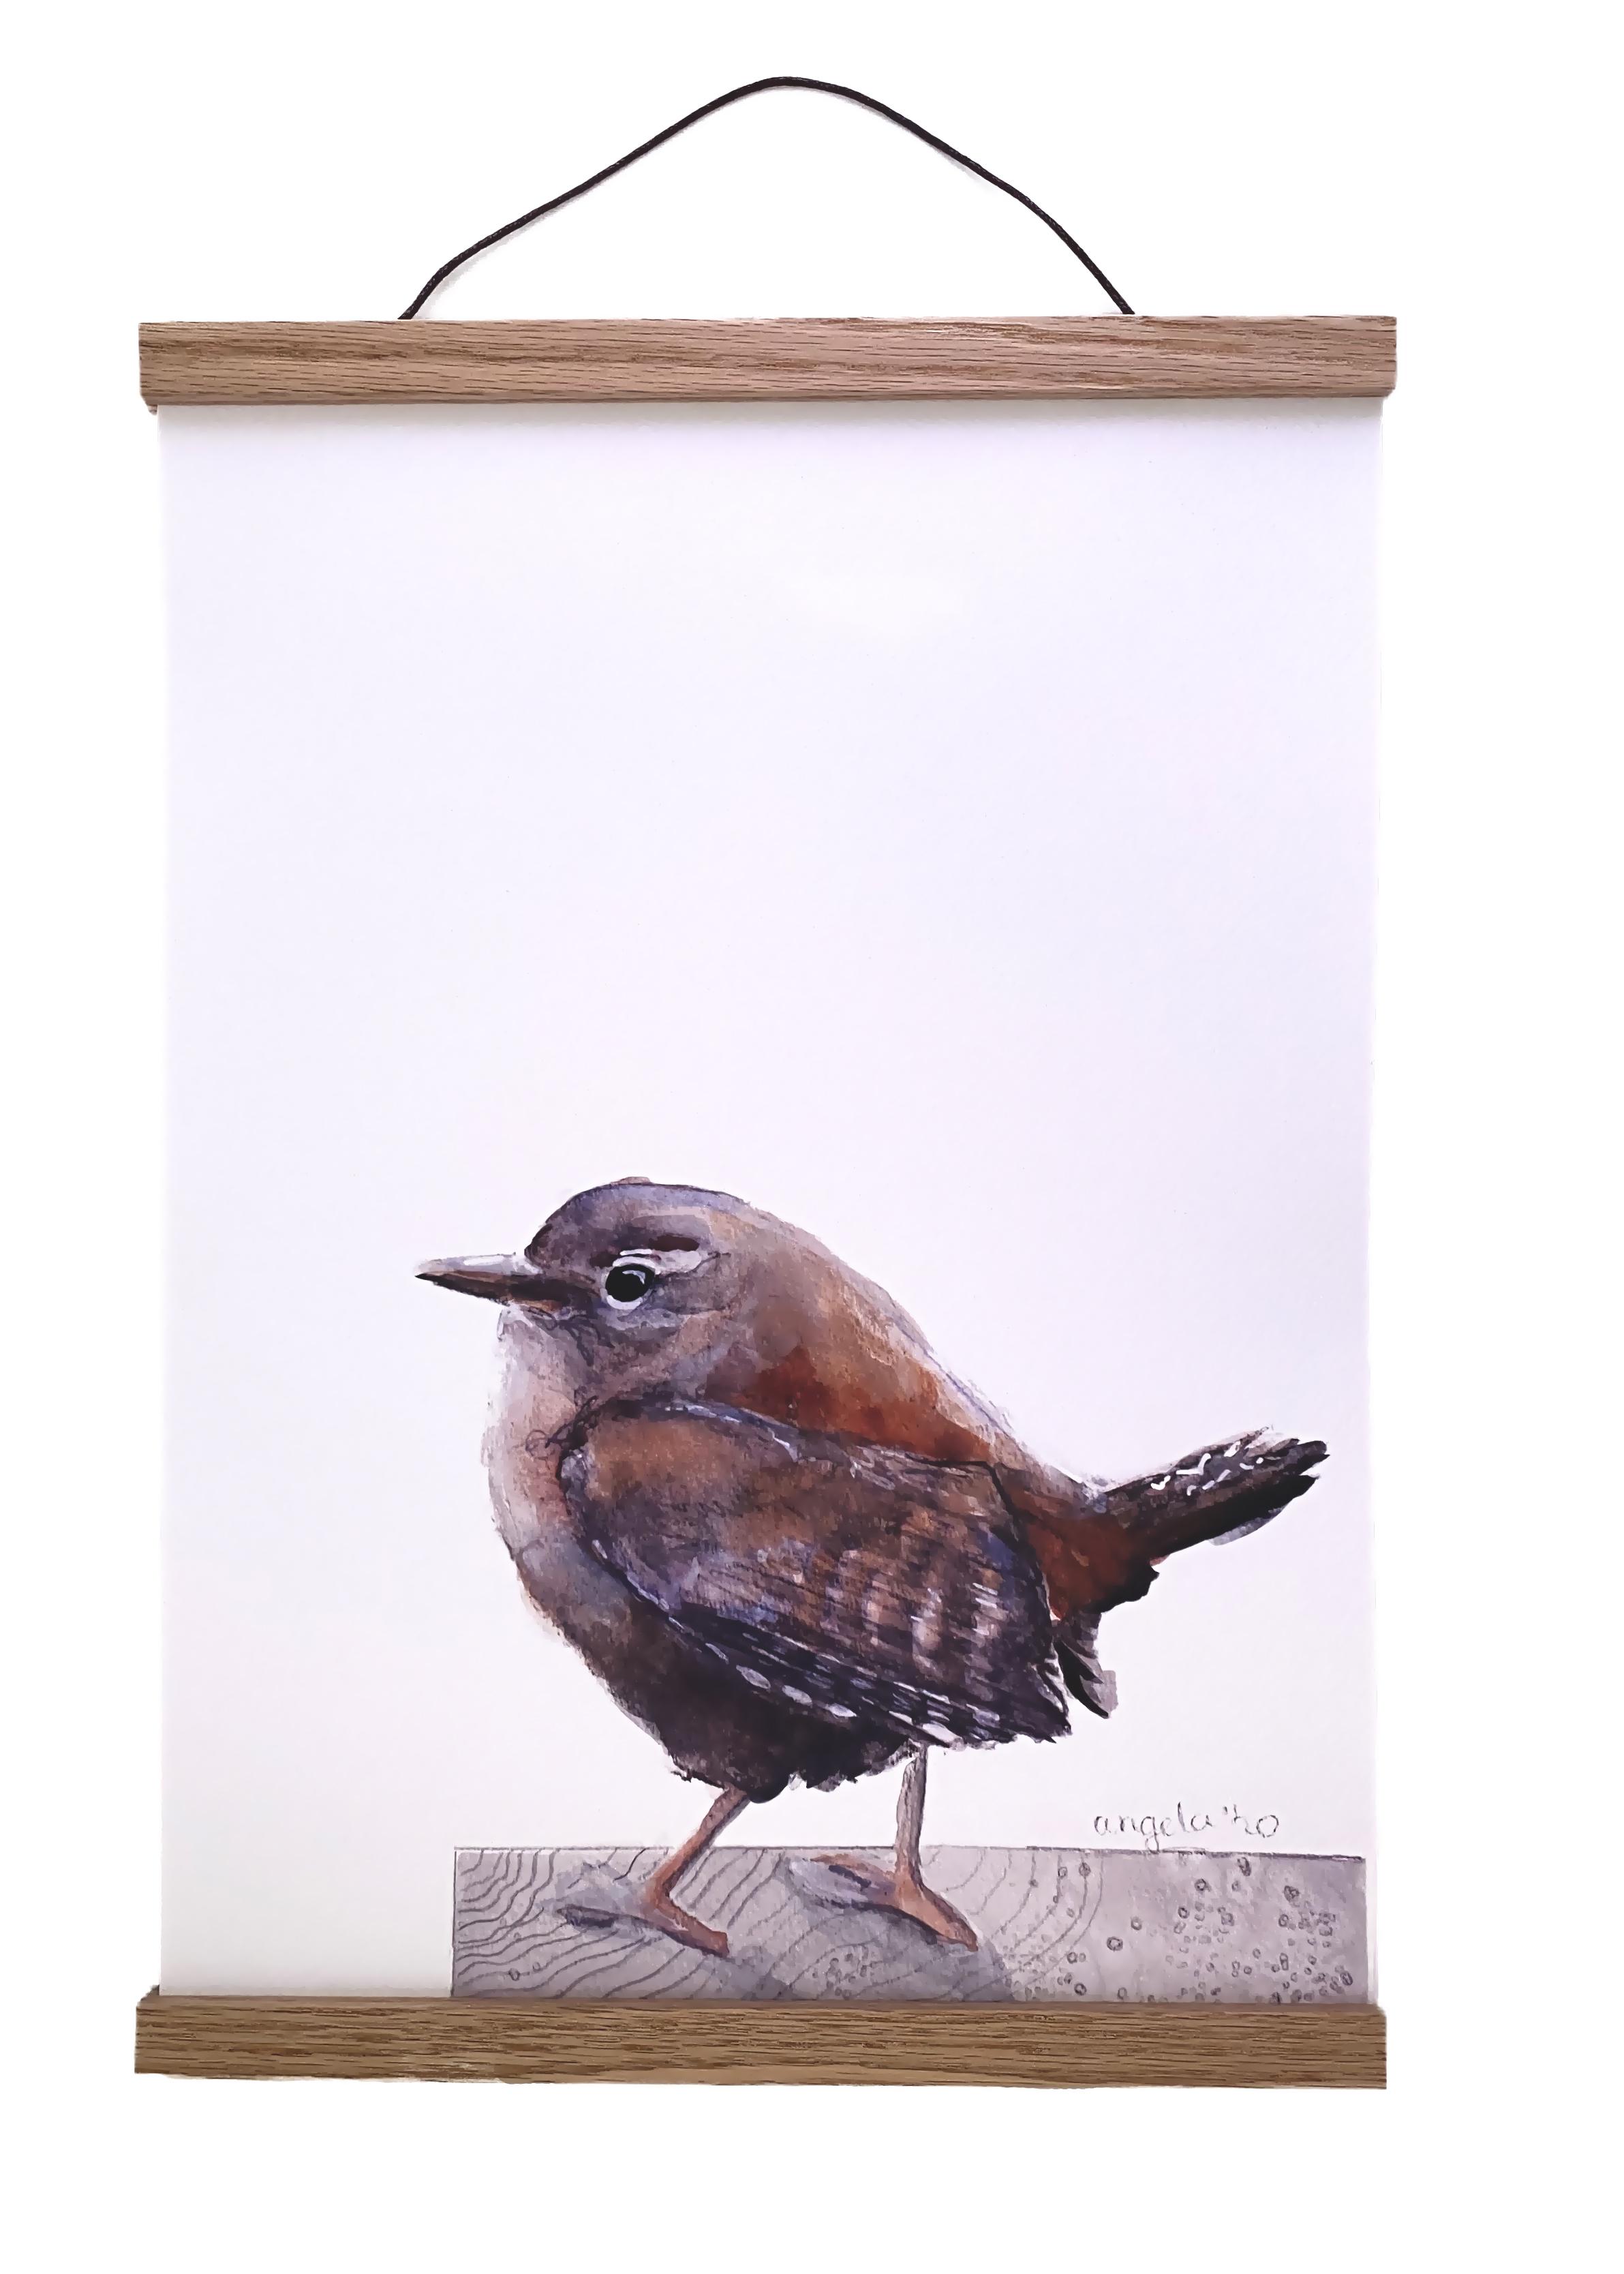 eiken houten poster hangers - poster frame - poster houder Angelart Kunst&Zo, Angela Peters